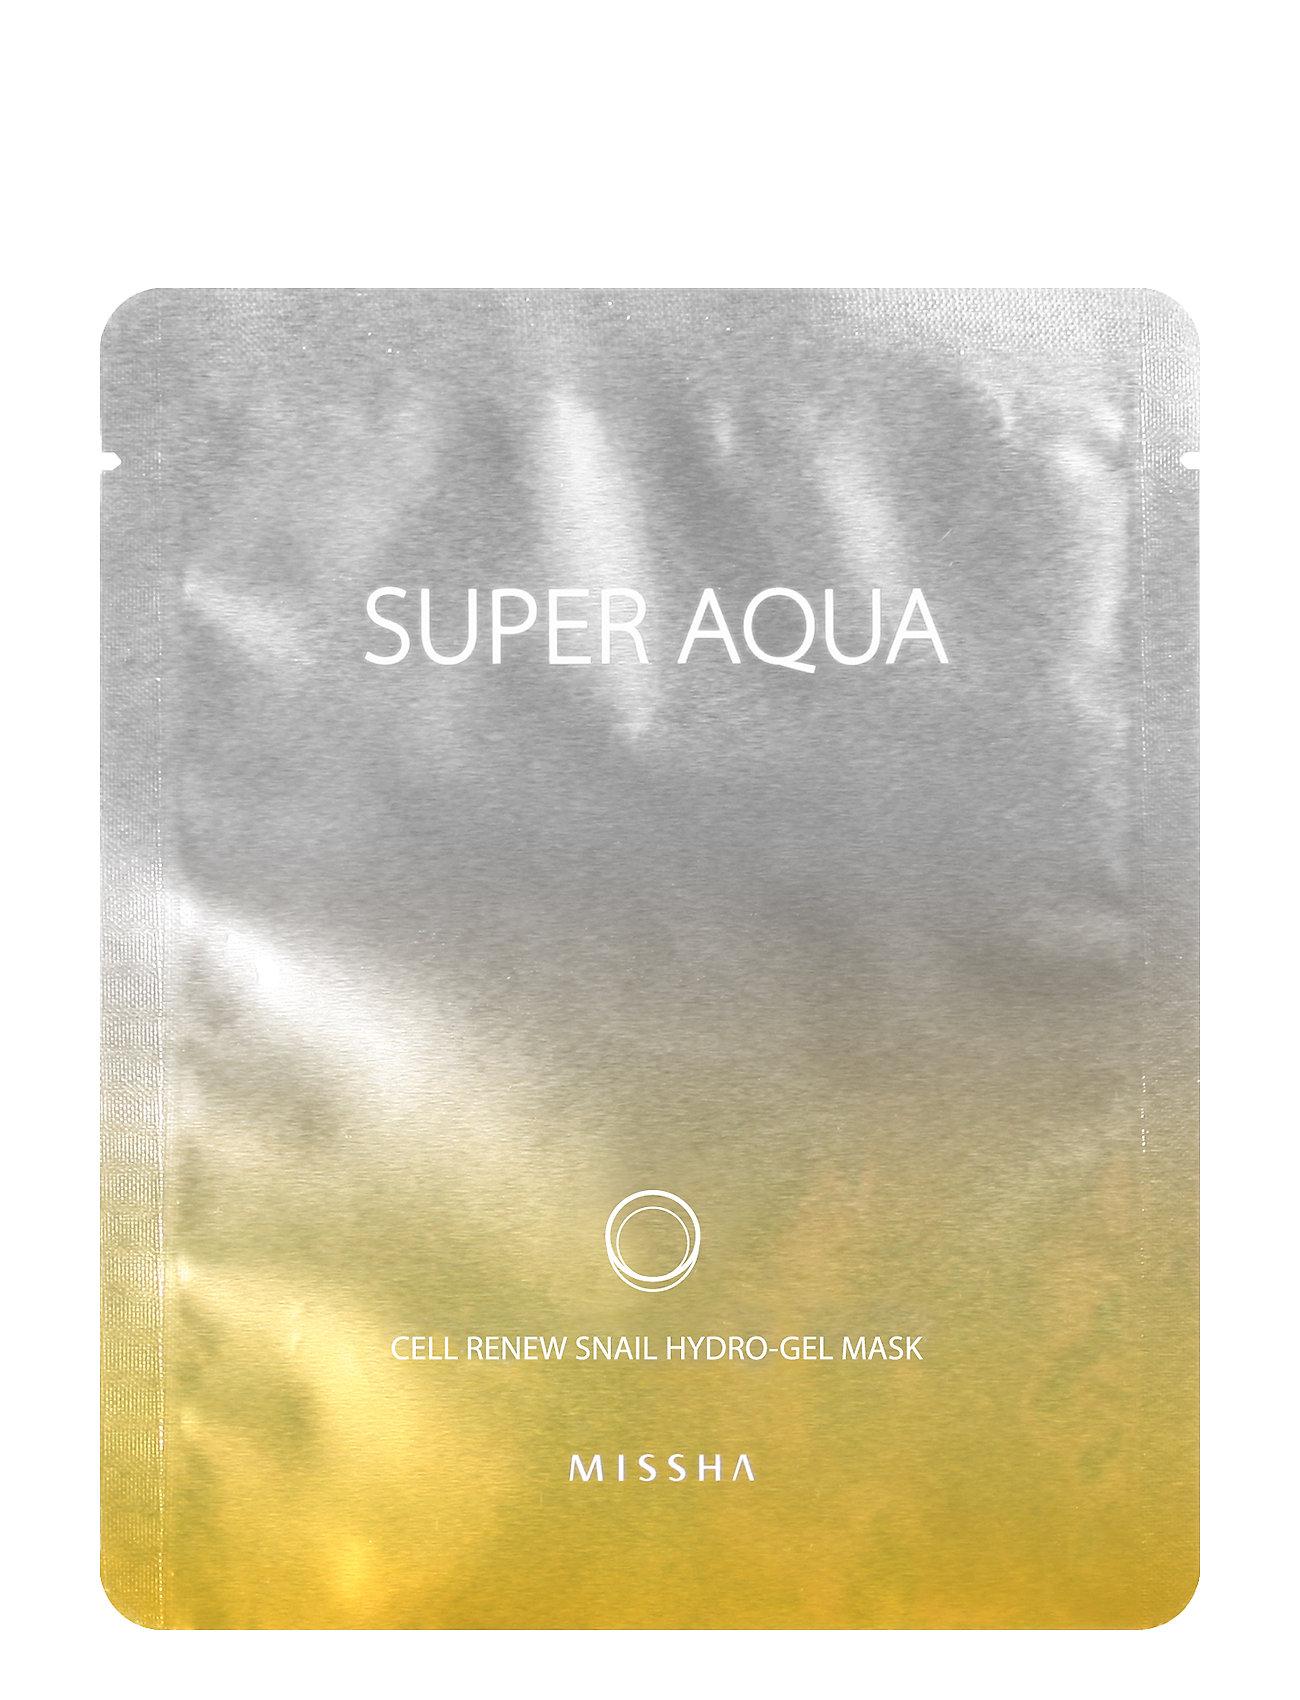 Missha Super Aqua Cell Renew Snail Hydro Gel Mask - Missha